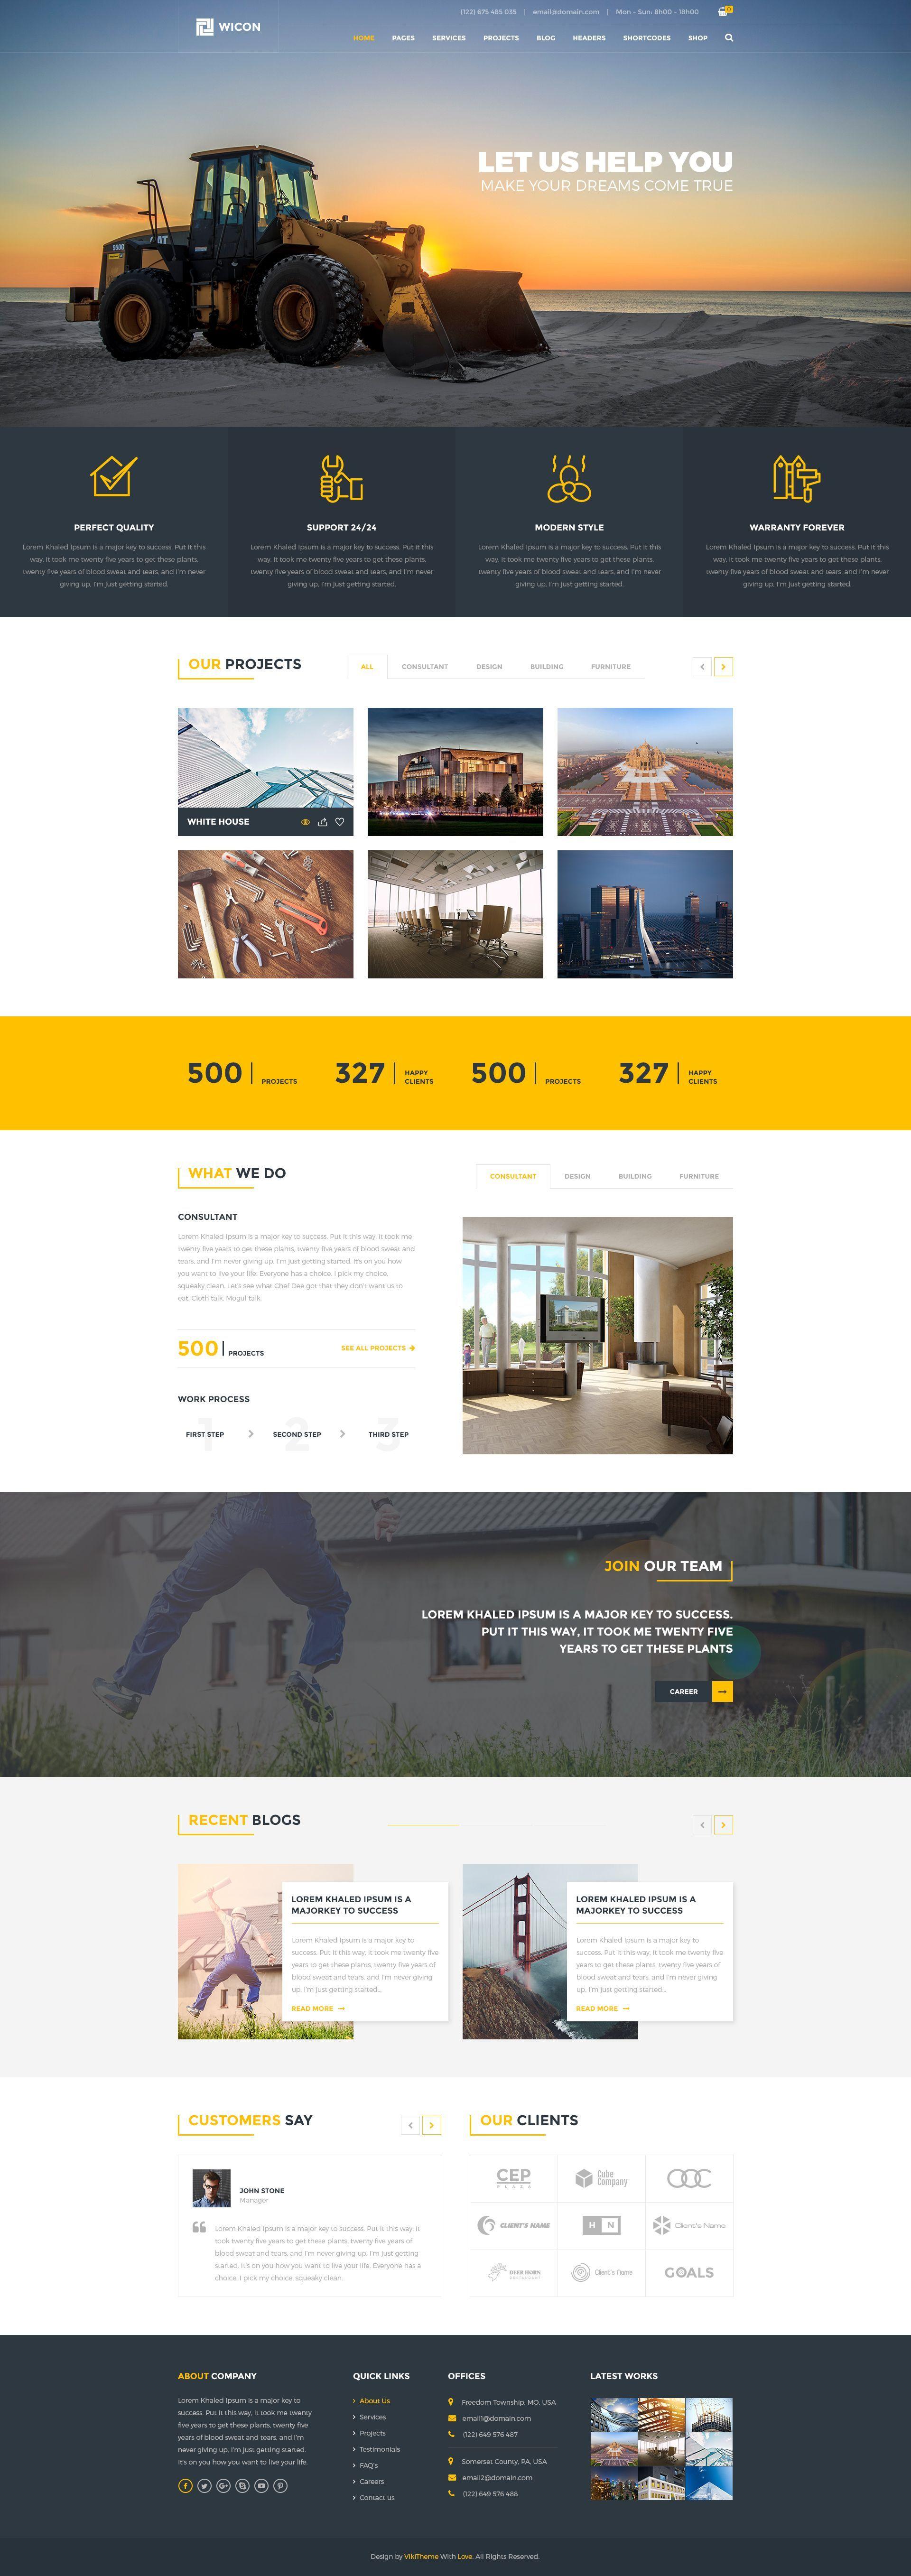 Law Website Ideas Lawwebsite In 2020 Web Layout Design Construction Website Creative Website Design